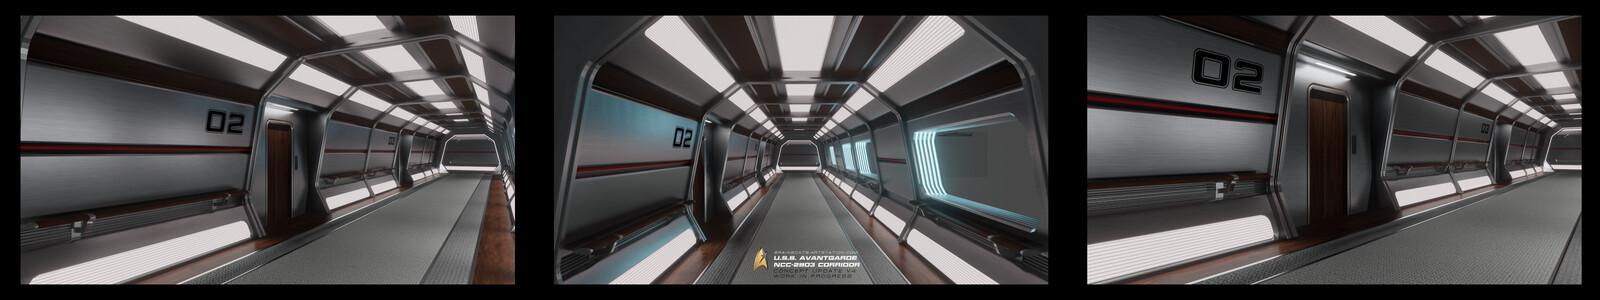 U.S.S. Avantgarde Corridor Concept V4